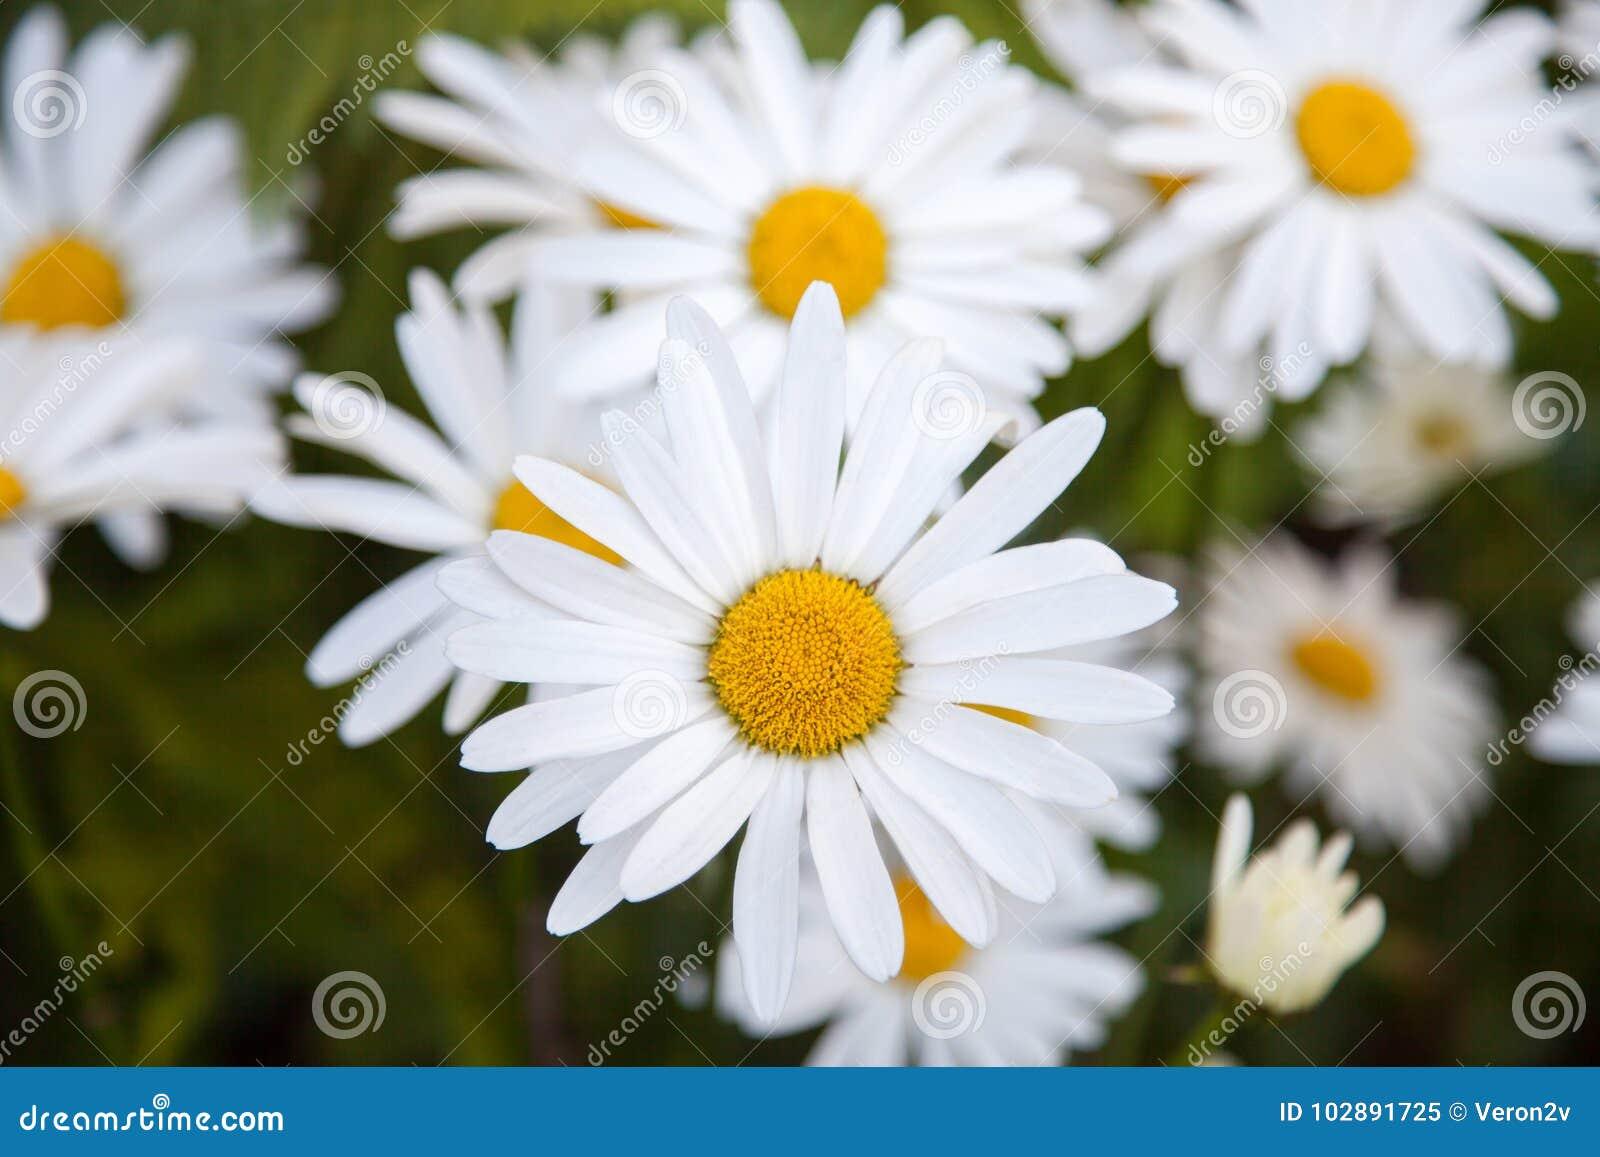 White camomiles stock image image of beautiful blurred 102891725 white camomiles mightylinksfo